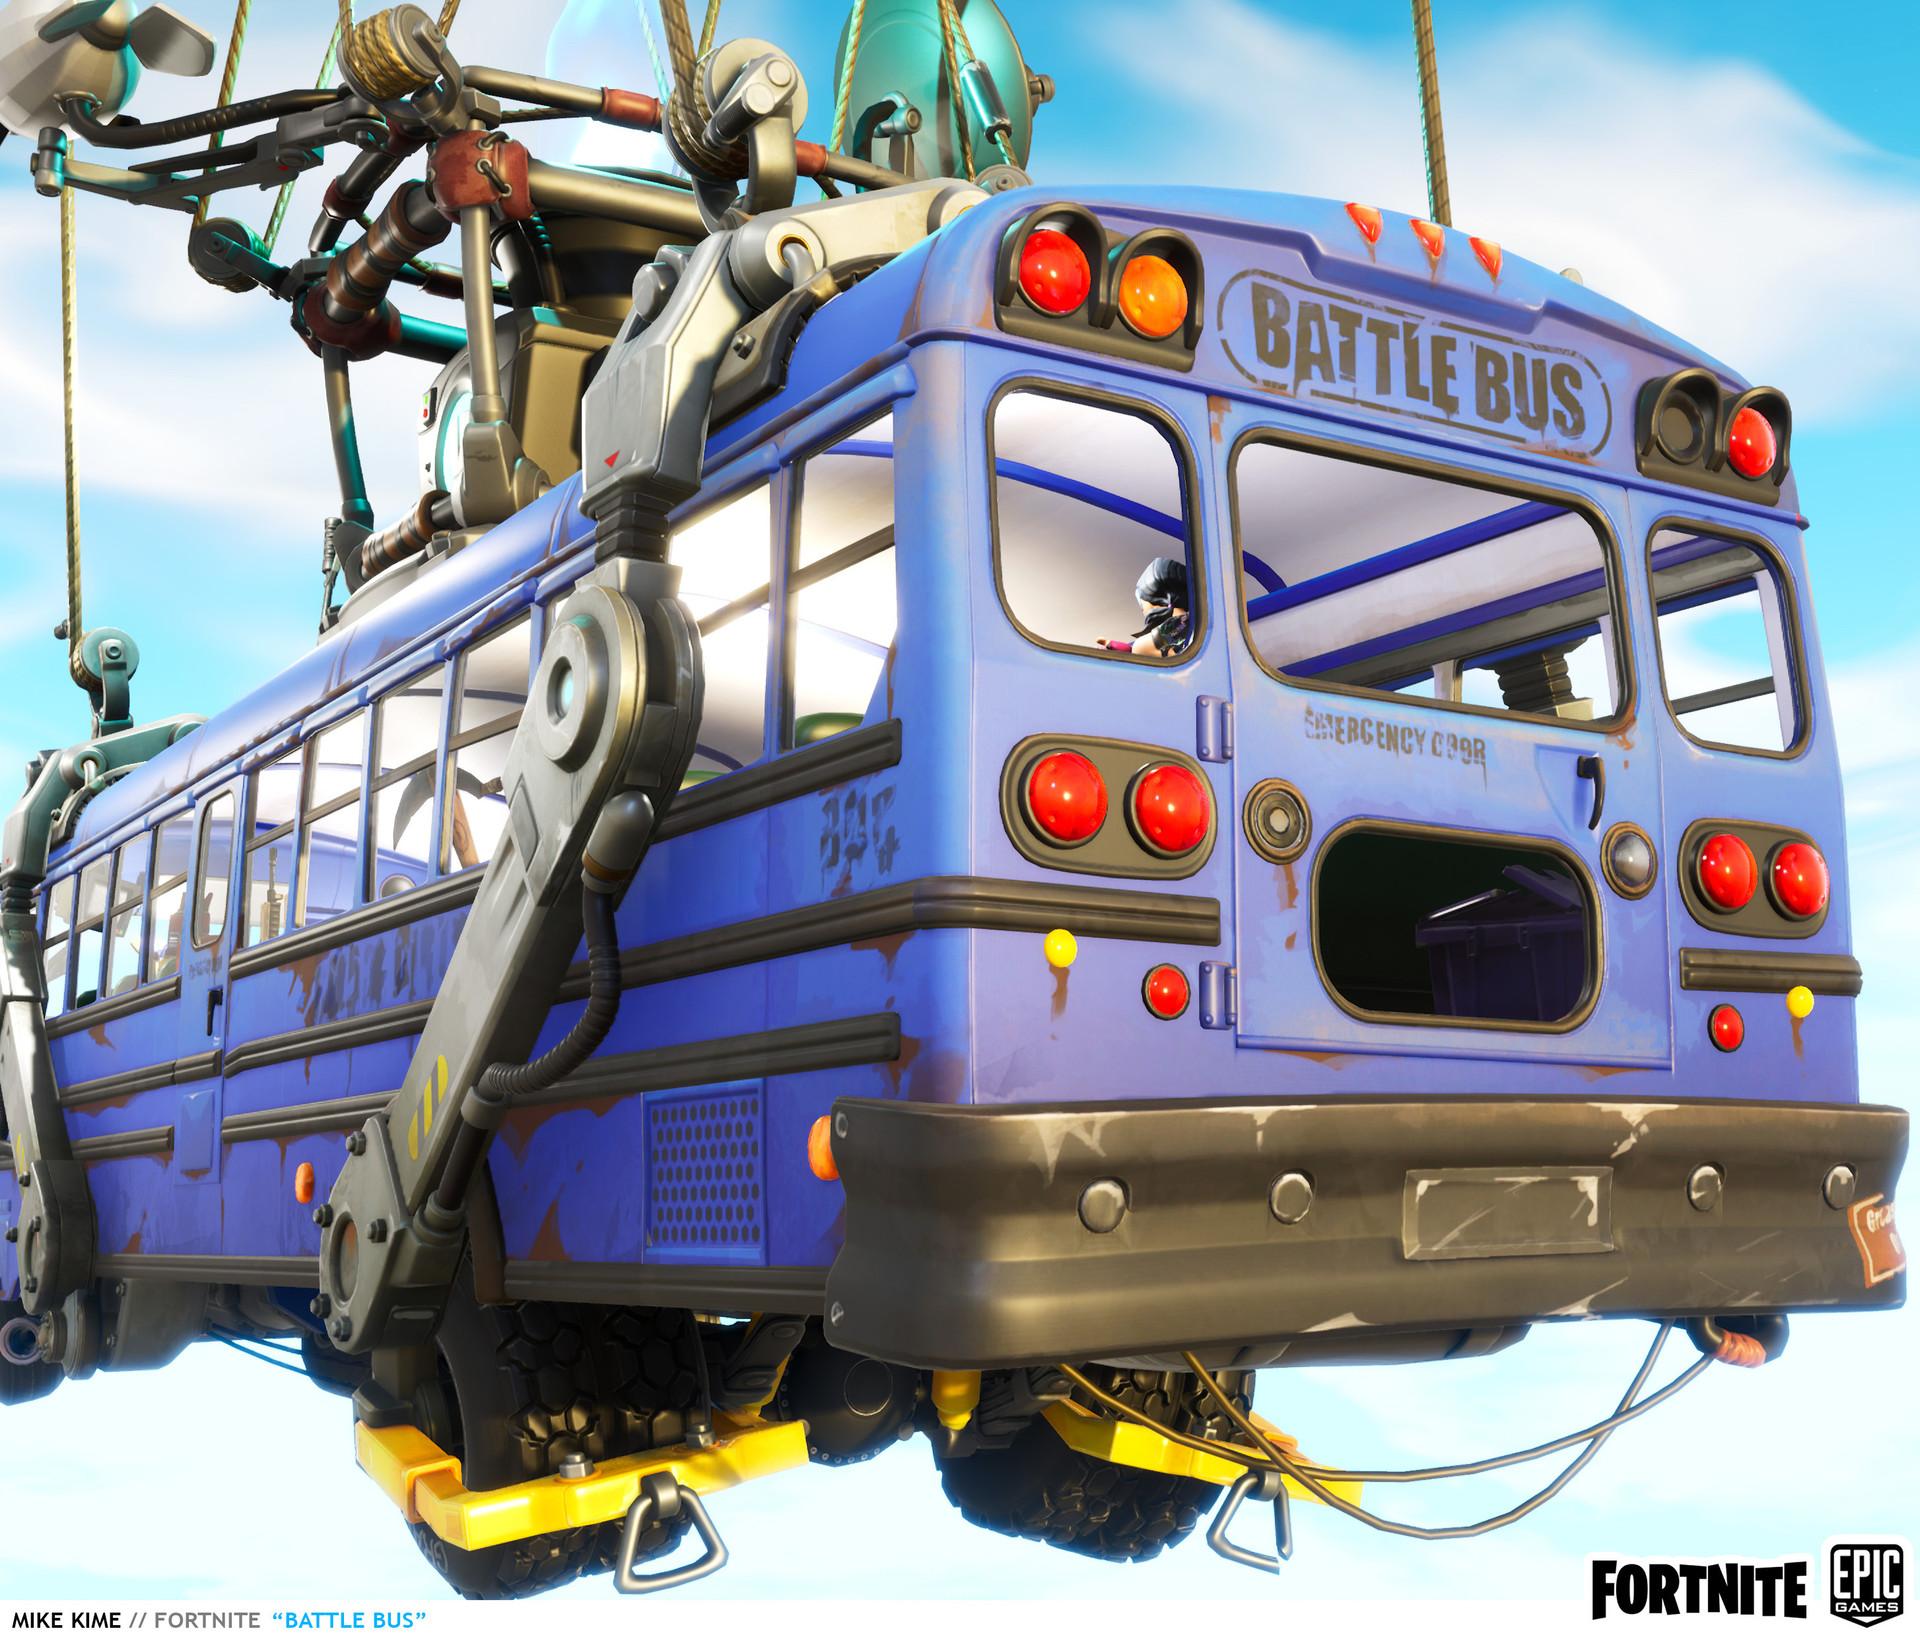 Mike kime fortnite battle bus back